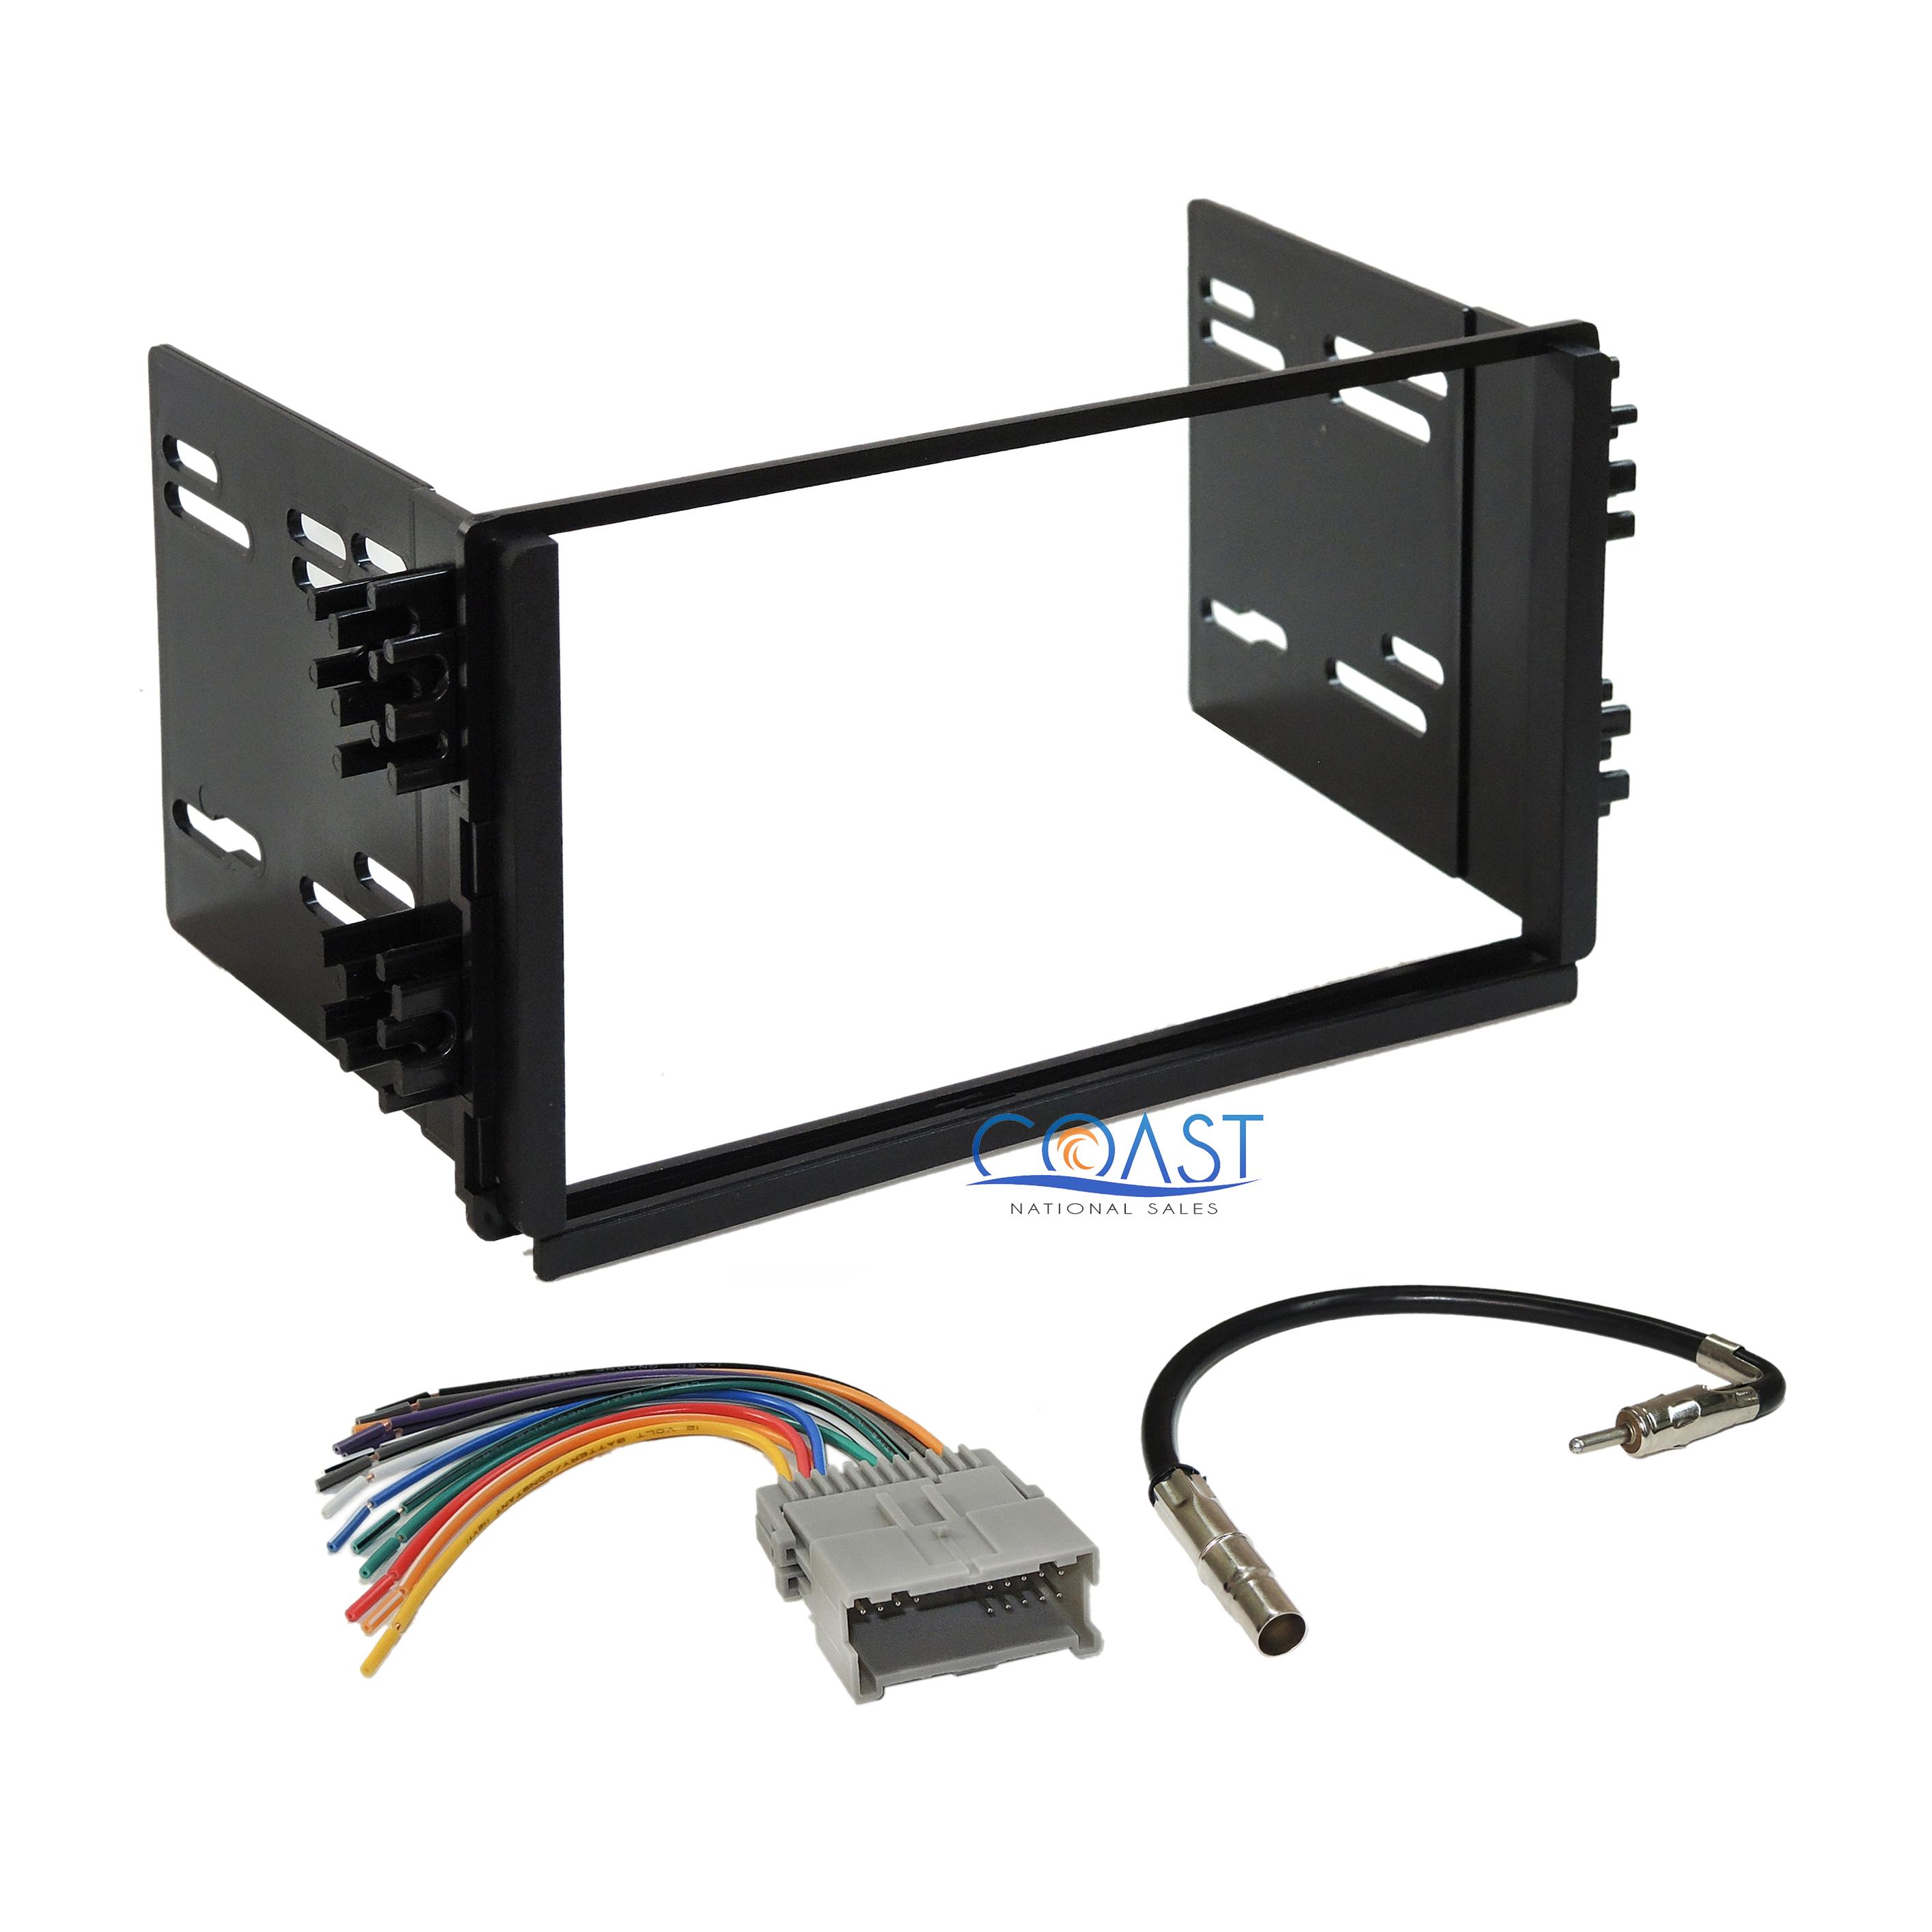 car stereo radio dash kit wiring harness antenna for 2003-2006 kia sorento  lx | ebay  ebay